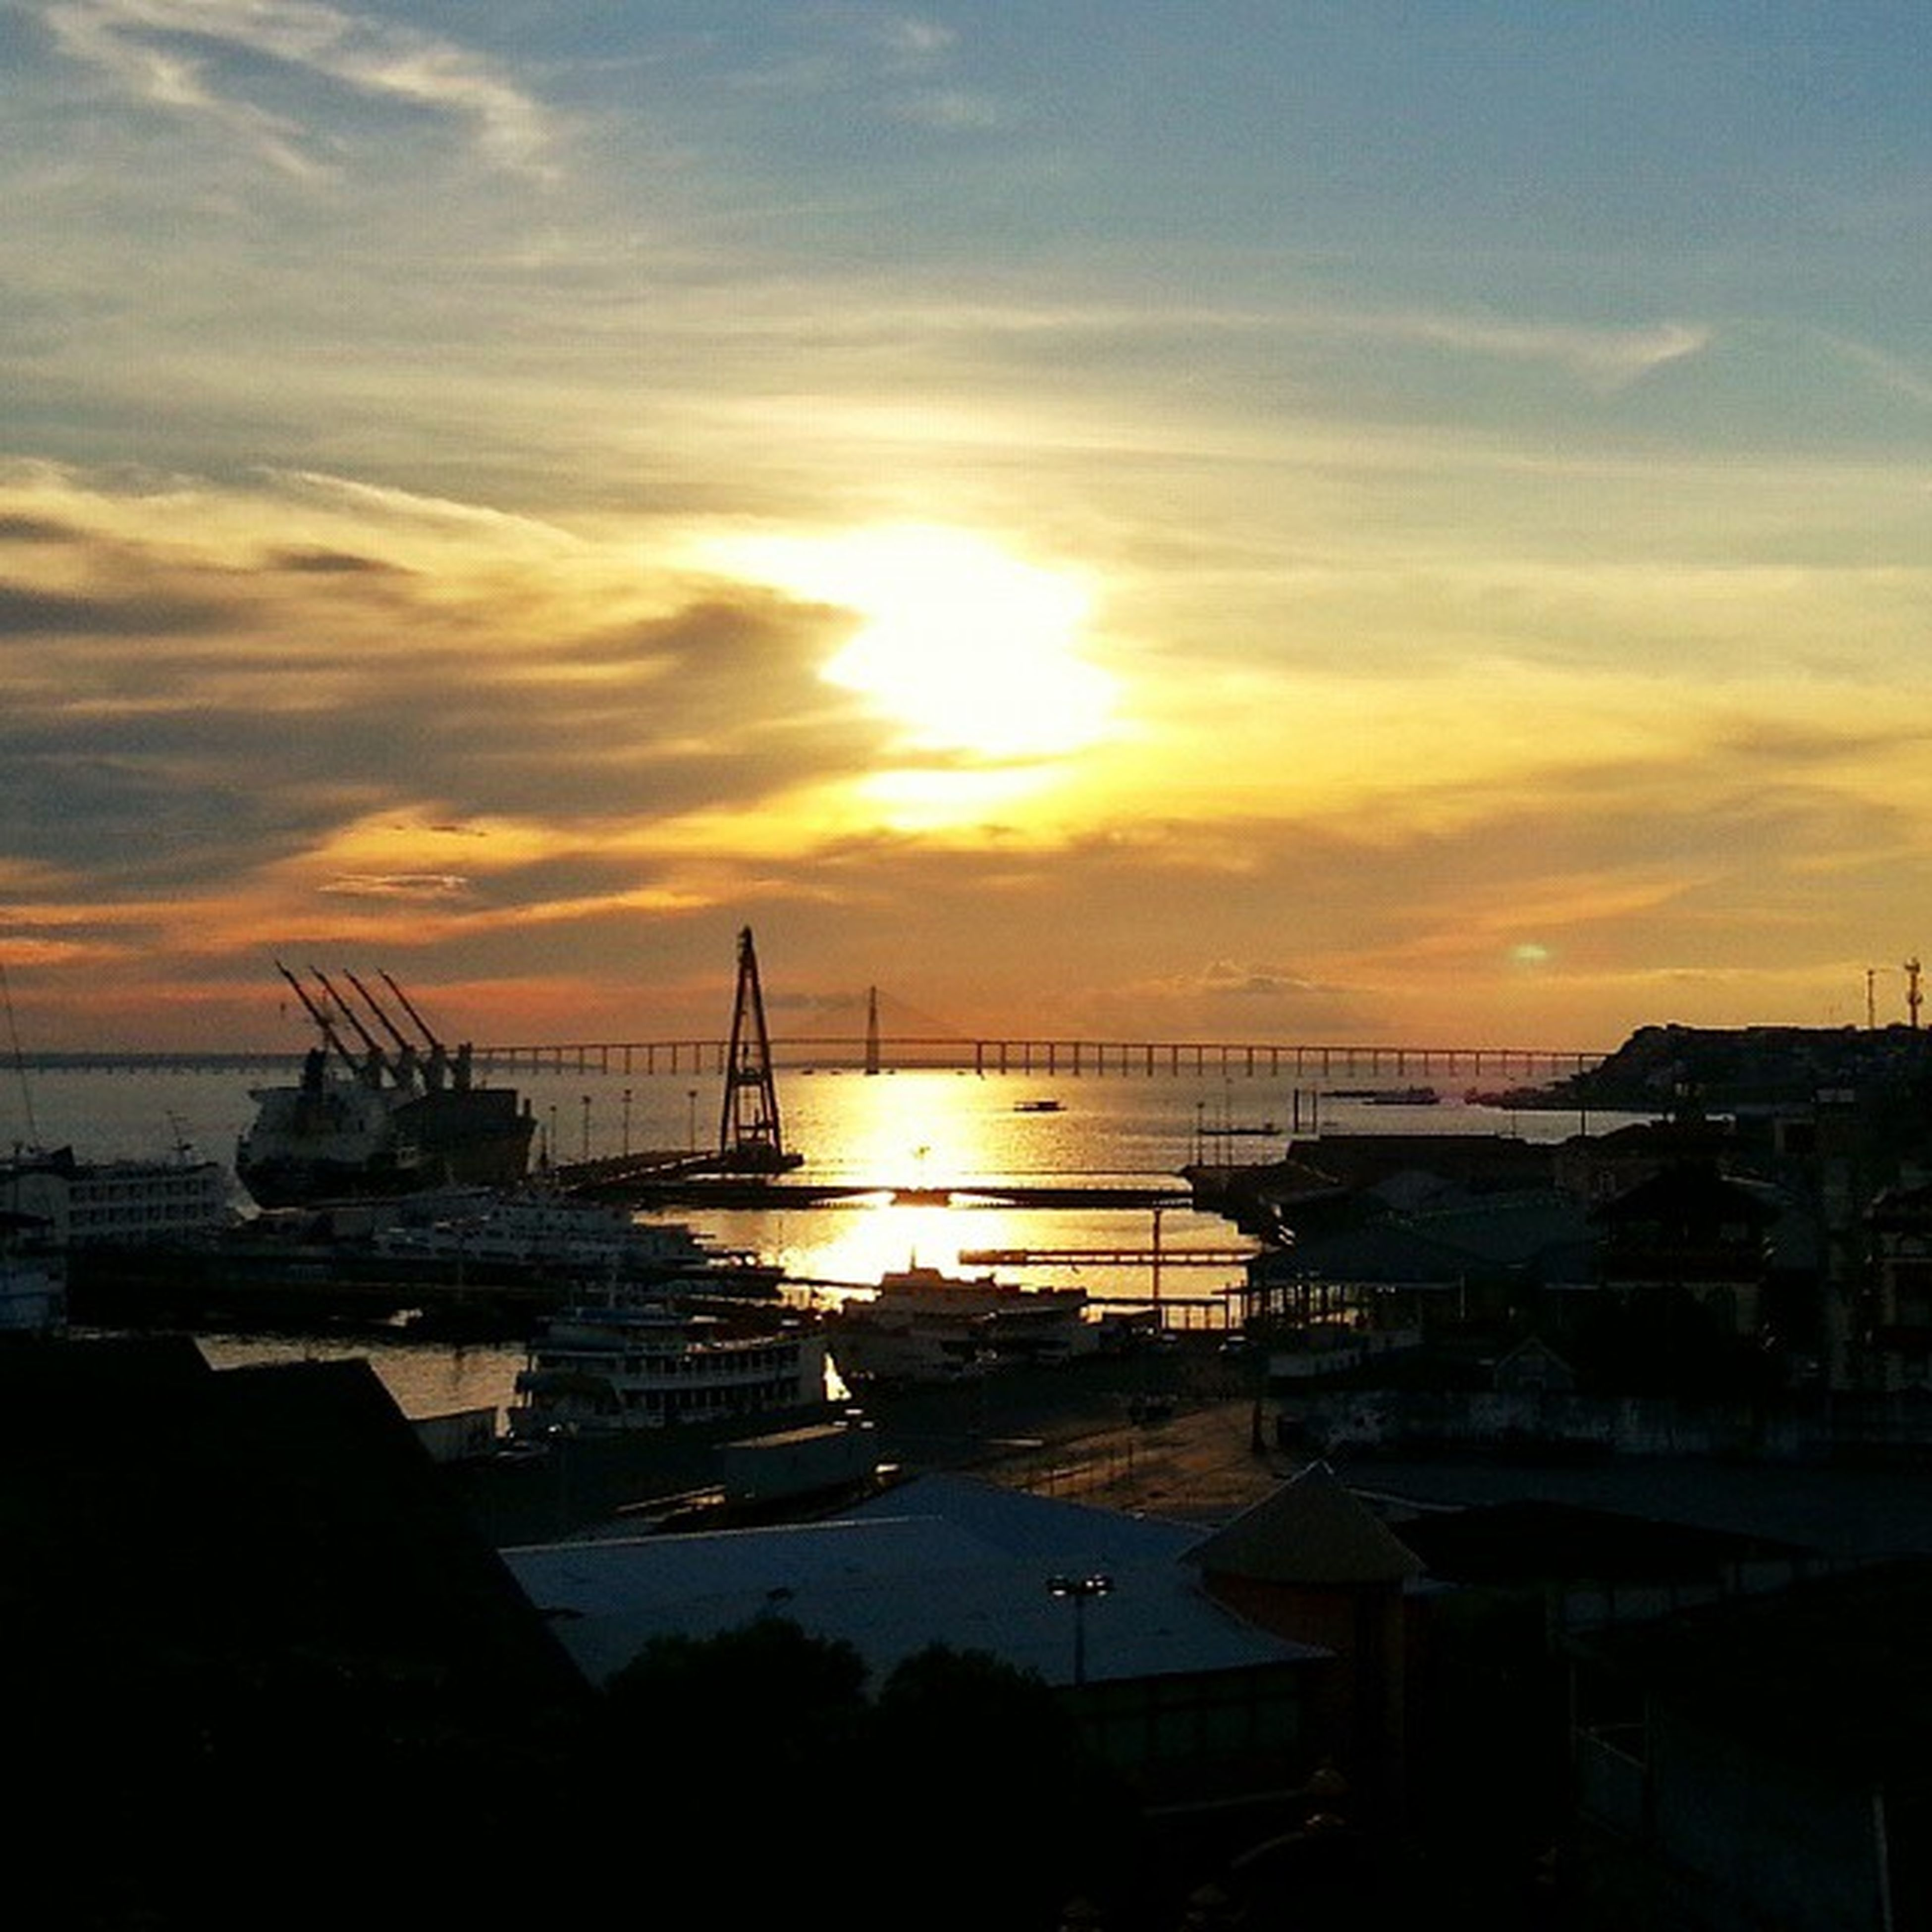 sunset, water, nautical vessel, transportation, sea, orange color, sky, mode of transport, silhouette, sun, boat, cloud - sky, beauty in nature, harbor, scenics, moored, built structure, nature, architecture, tranquil scene